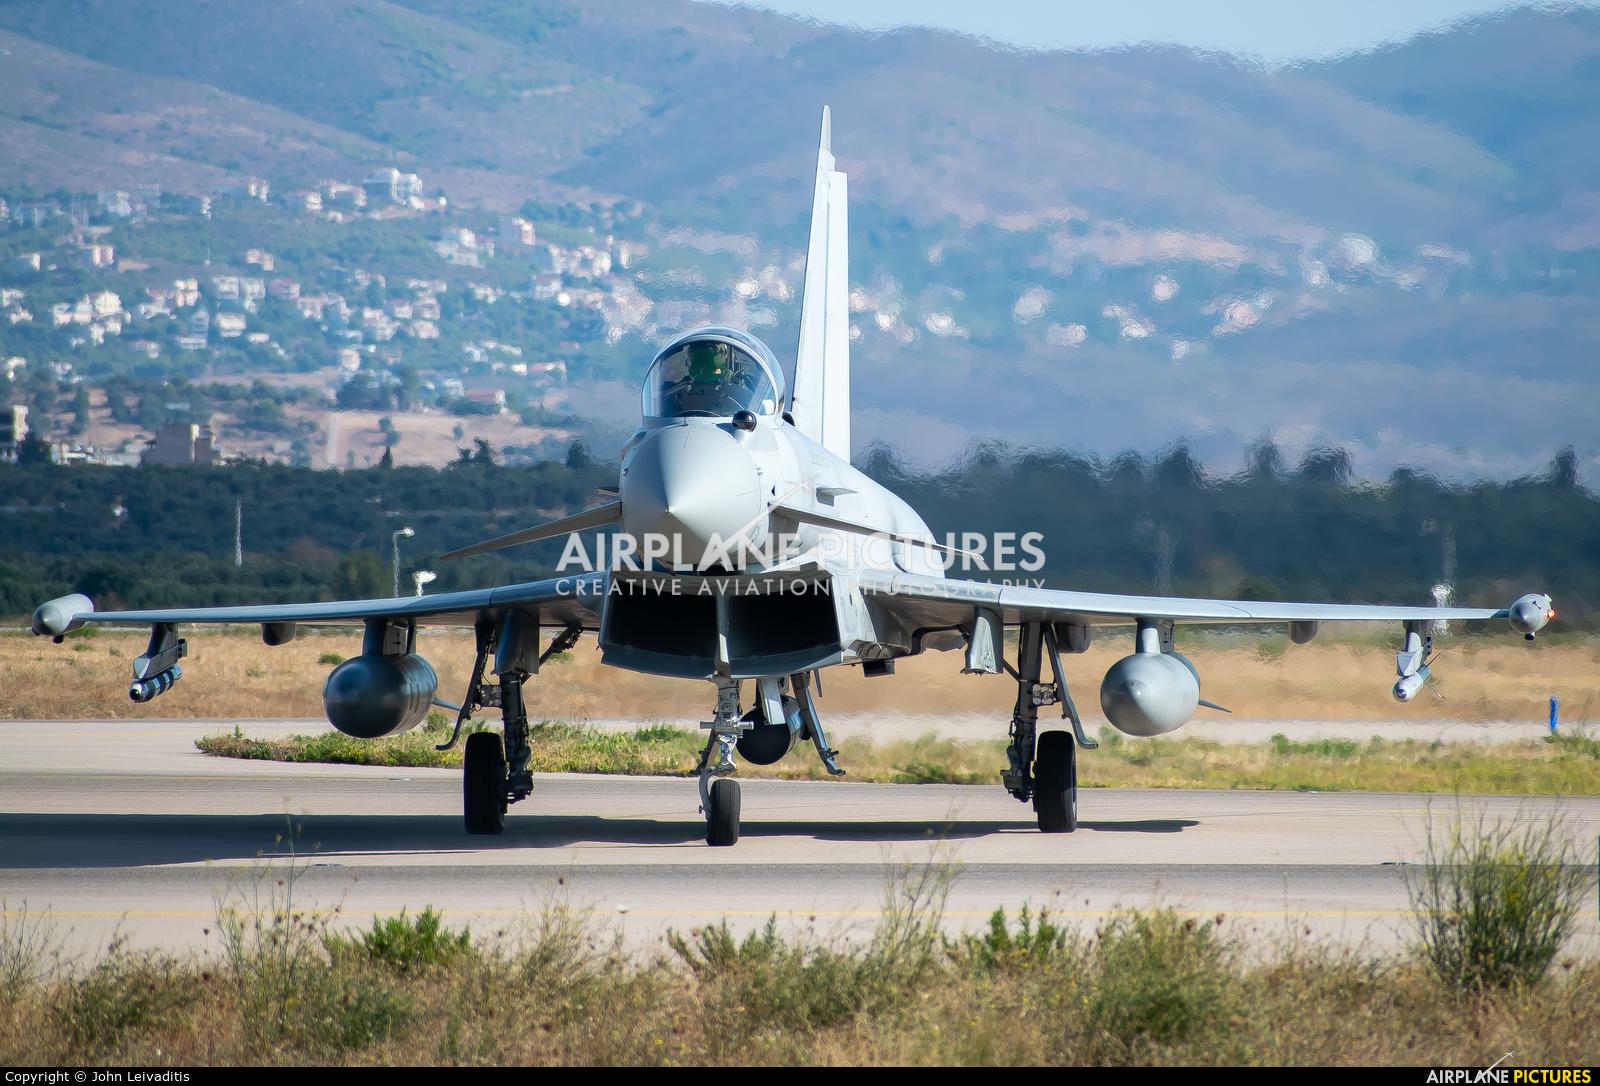 Royal Air Force ZK329 aircraft at Athens - Eleftherios Venizelos